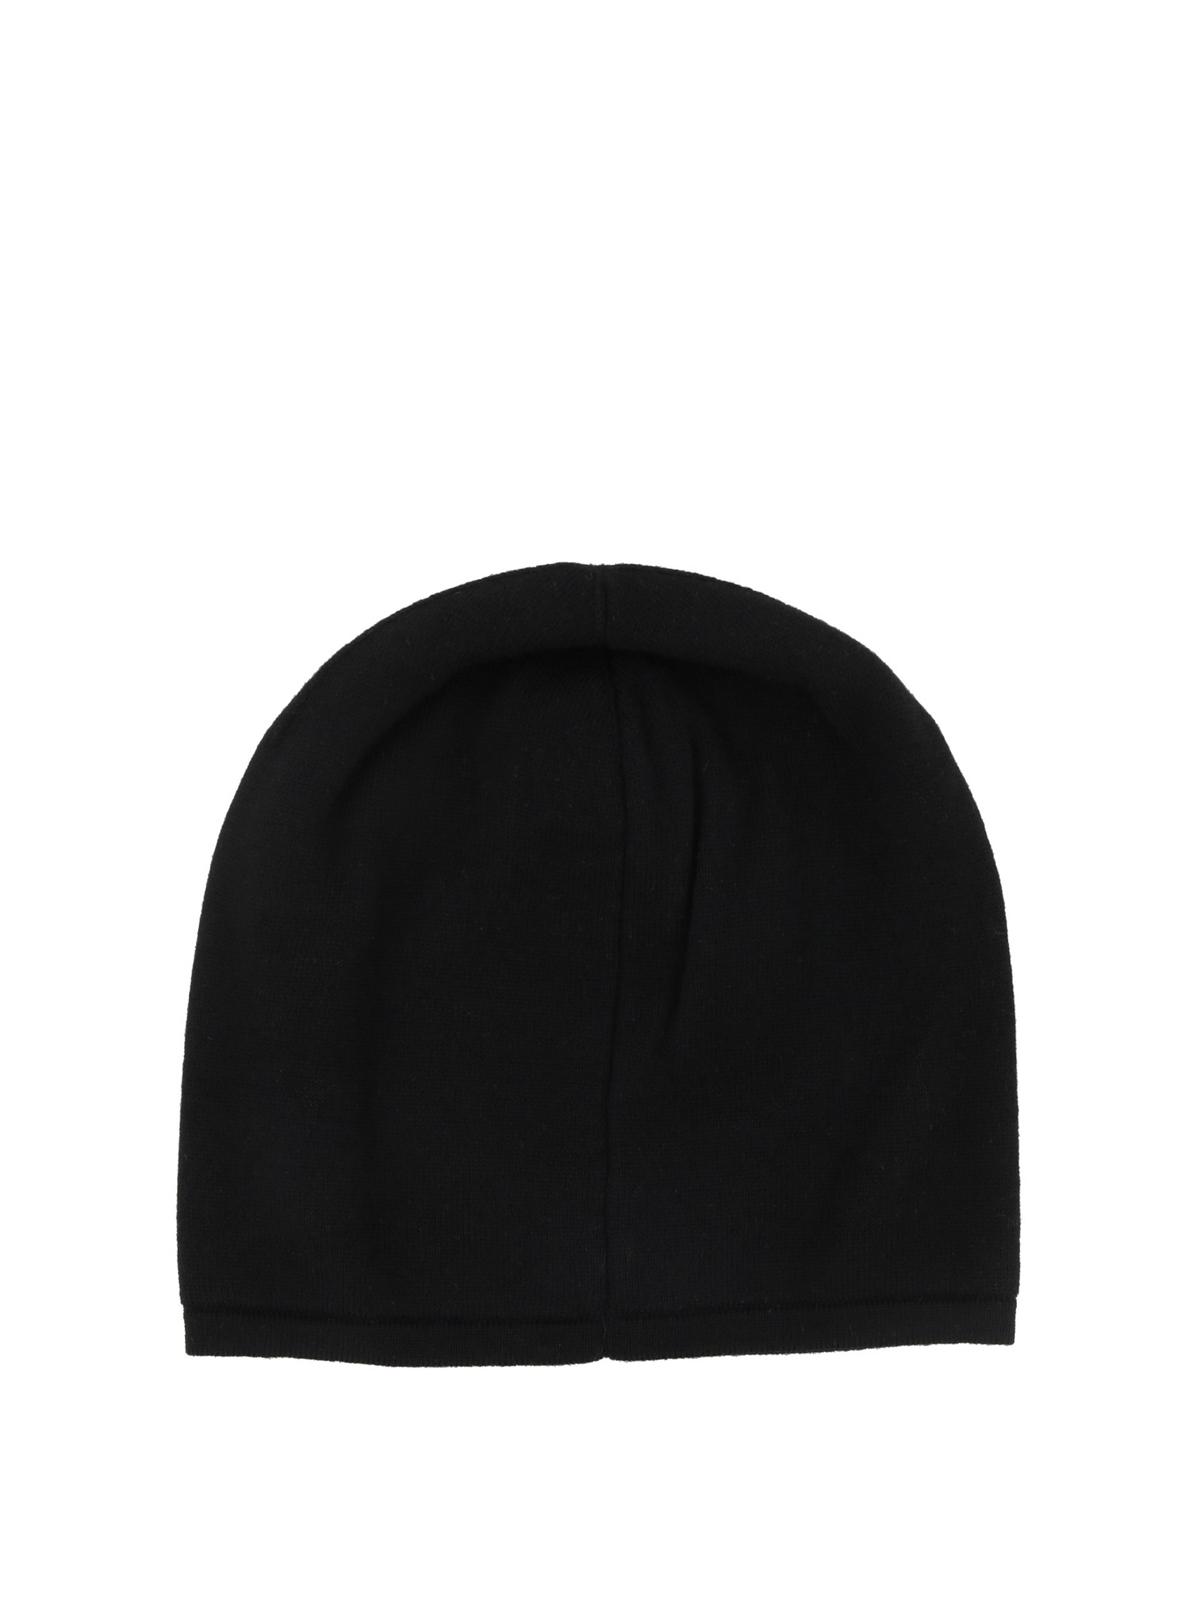 Fendi - Wool beanie with leather Bag Bugs - beanies - FXQ0532W0F0QA1 82c0a0d08a2